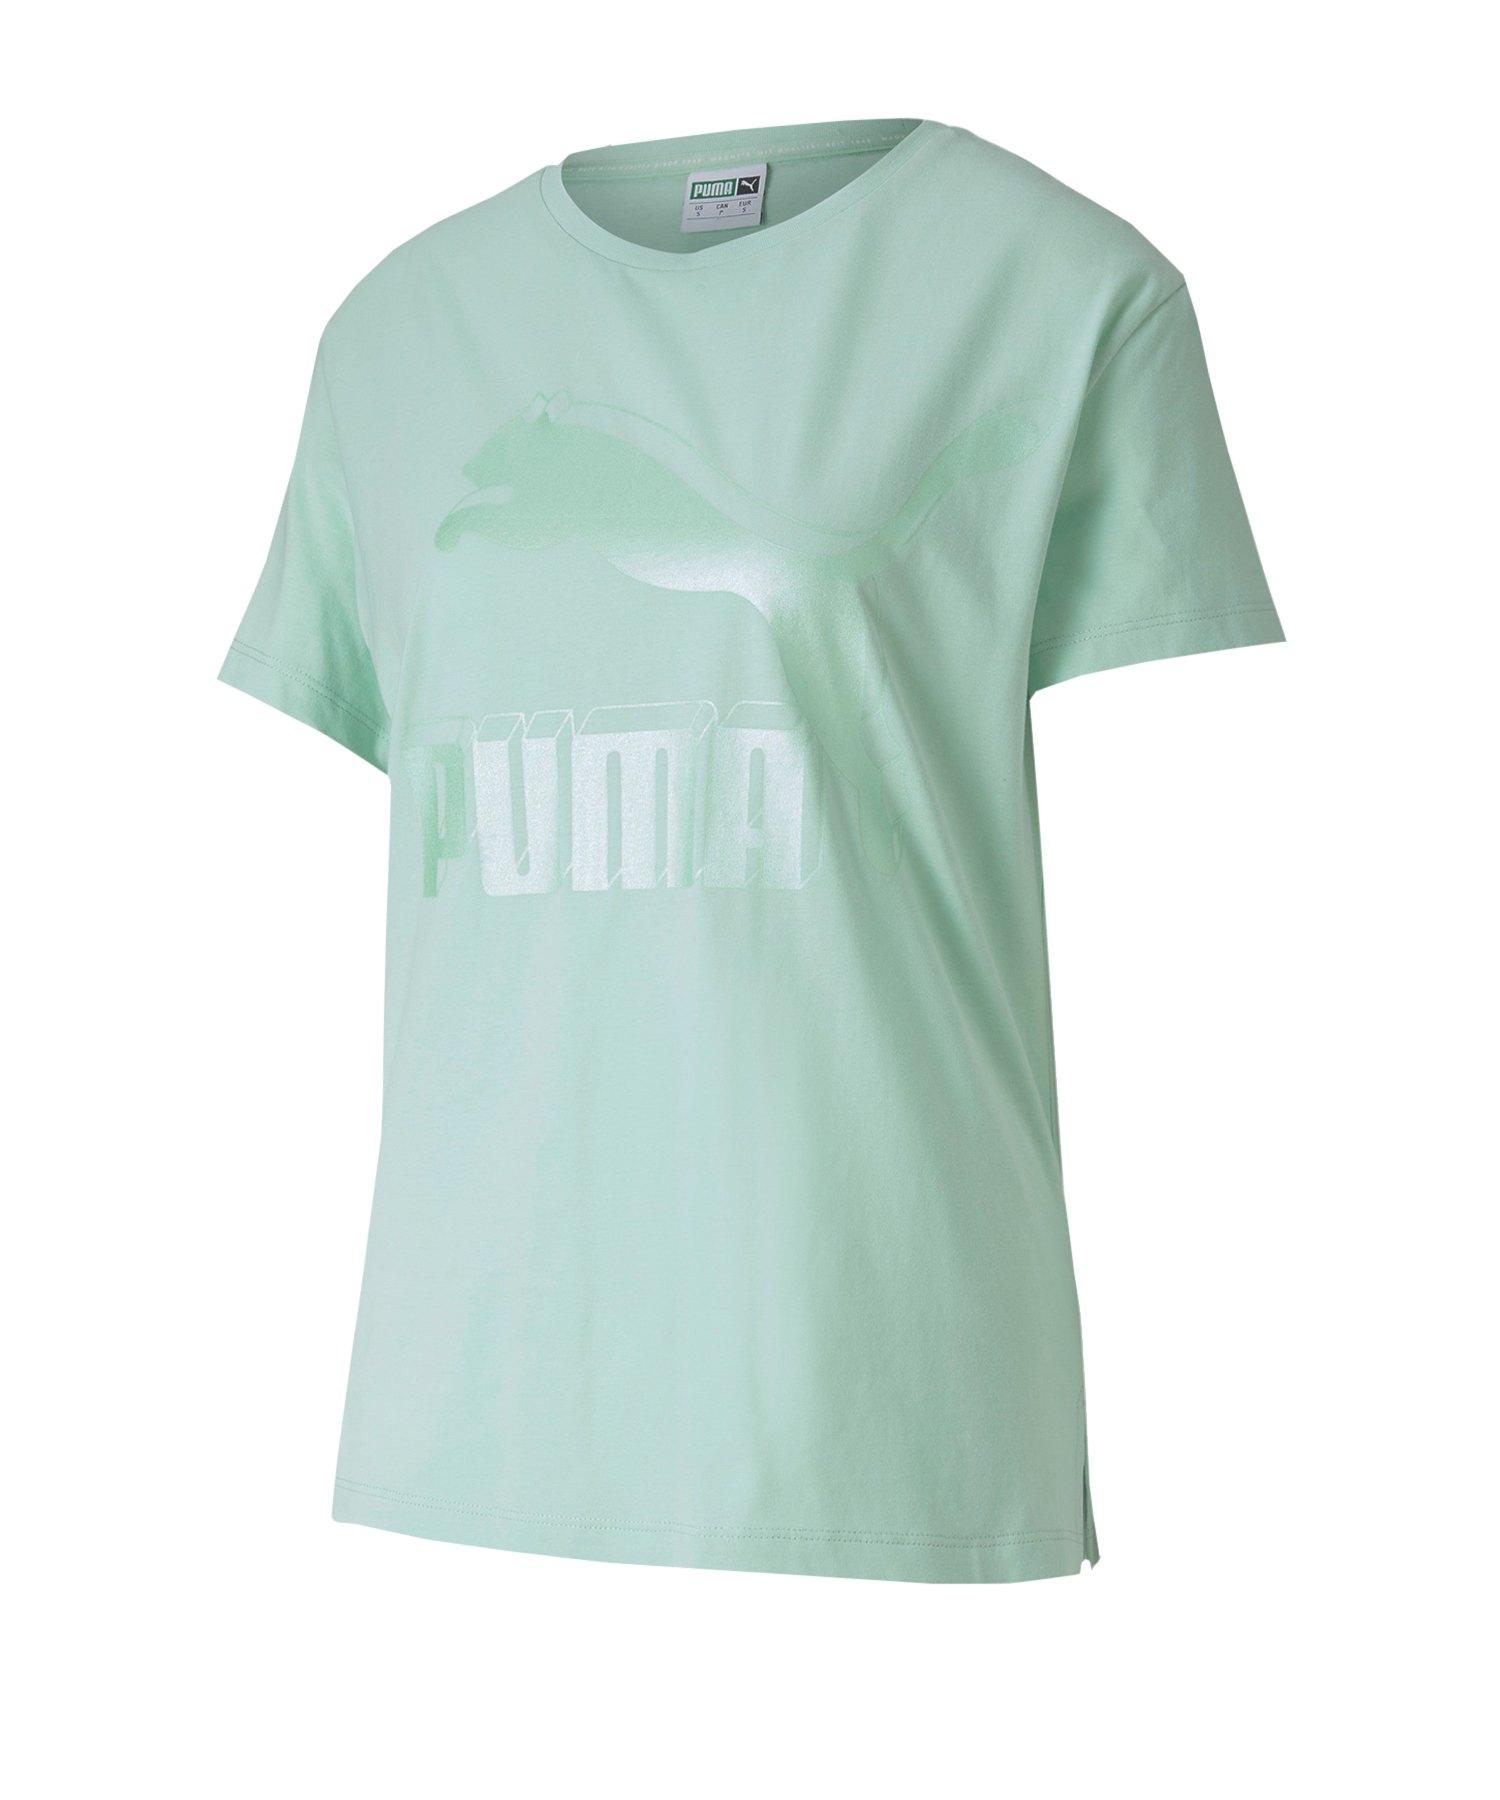 Puma Classic Logo T Shirt Damen Grun F94 Lifestyle Freizeit